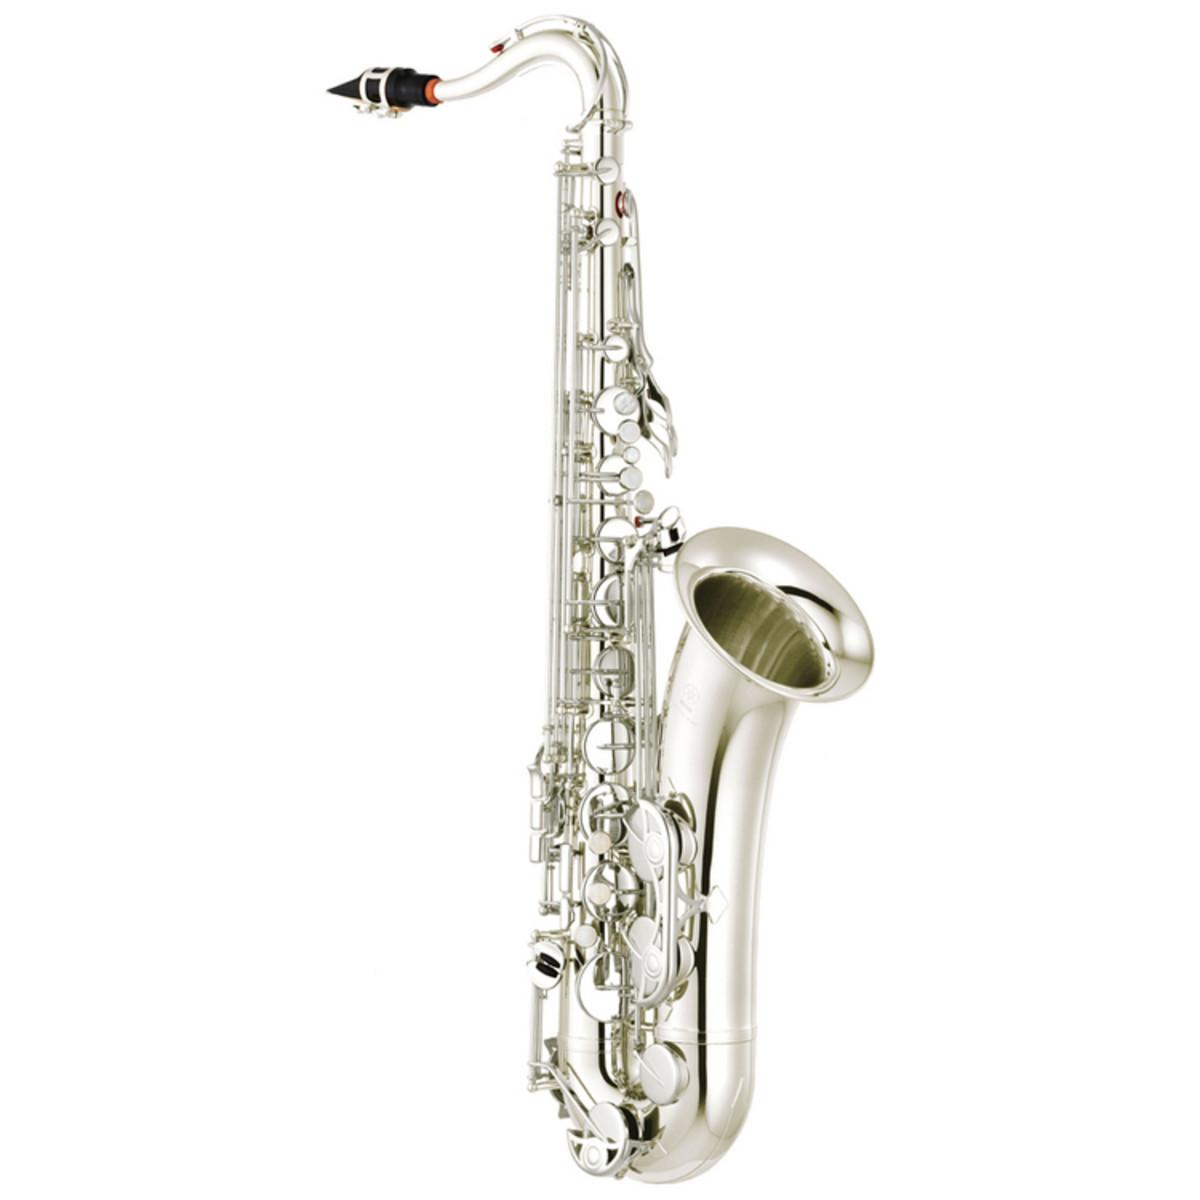 Yamaha yts280s student tenor saxophone silver nearly for Yamaha student saxophone